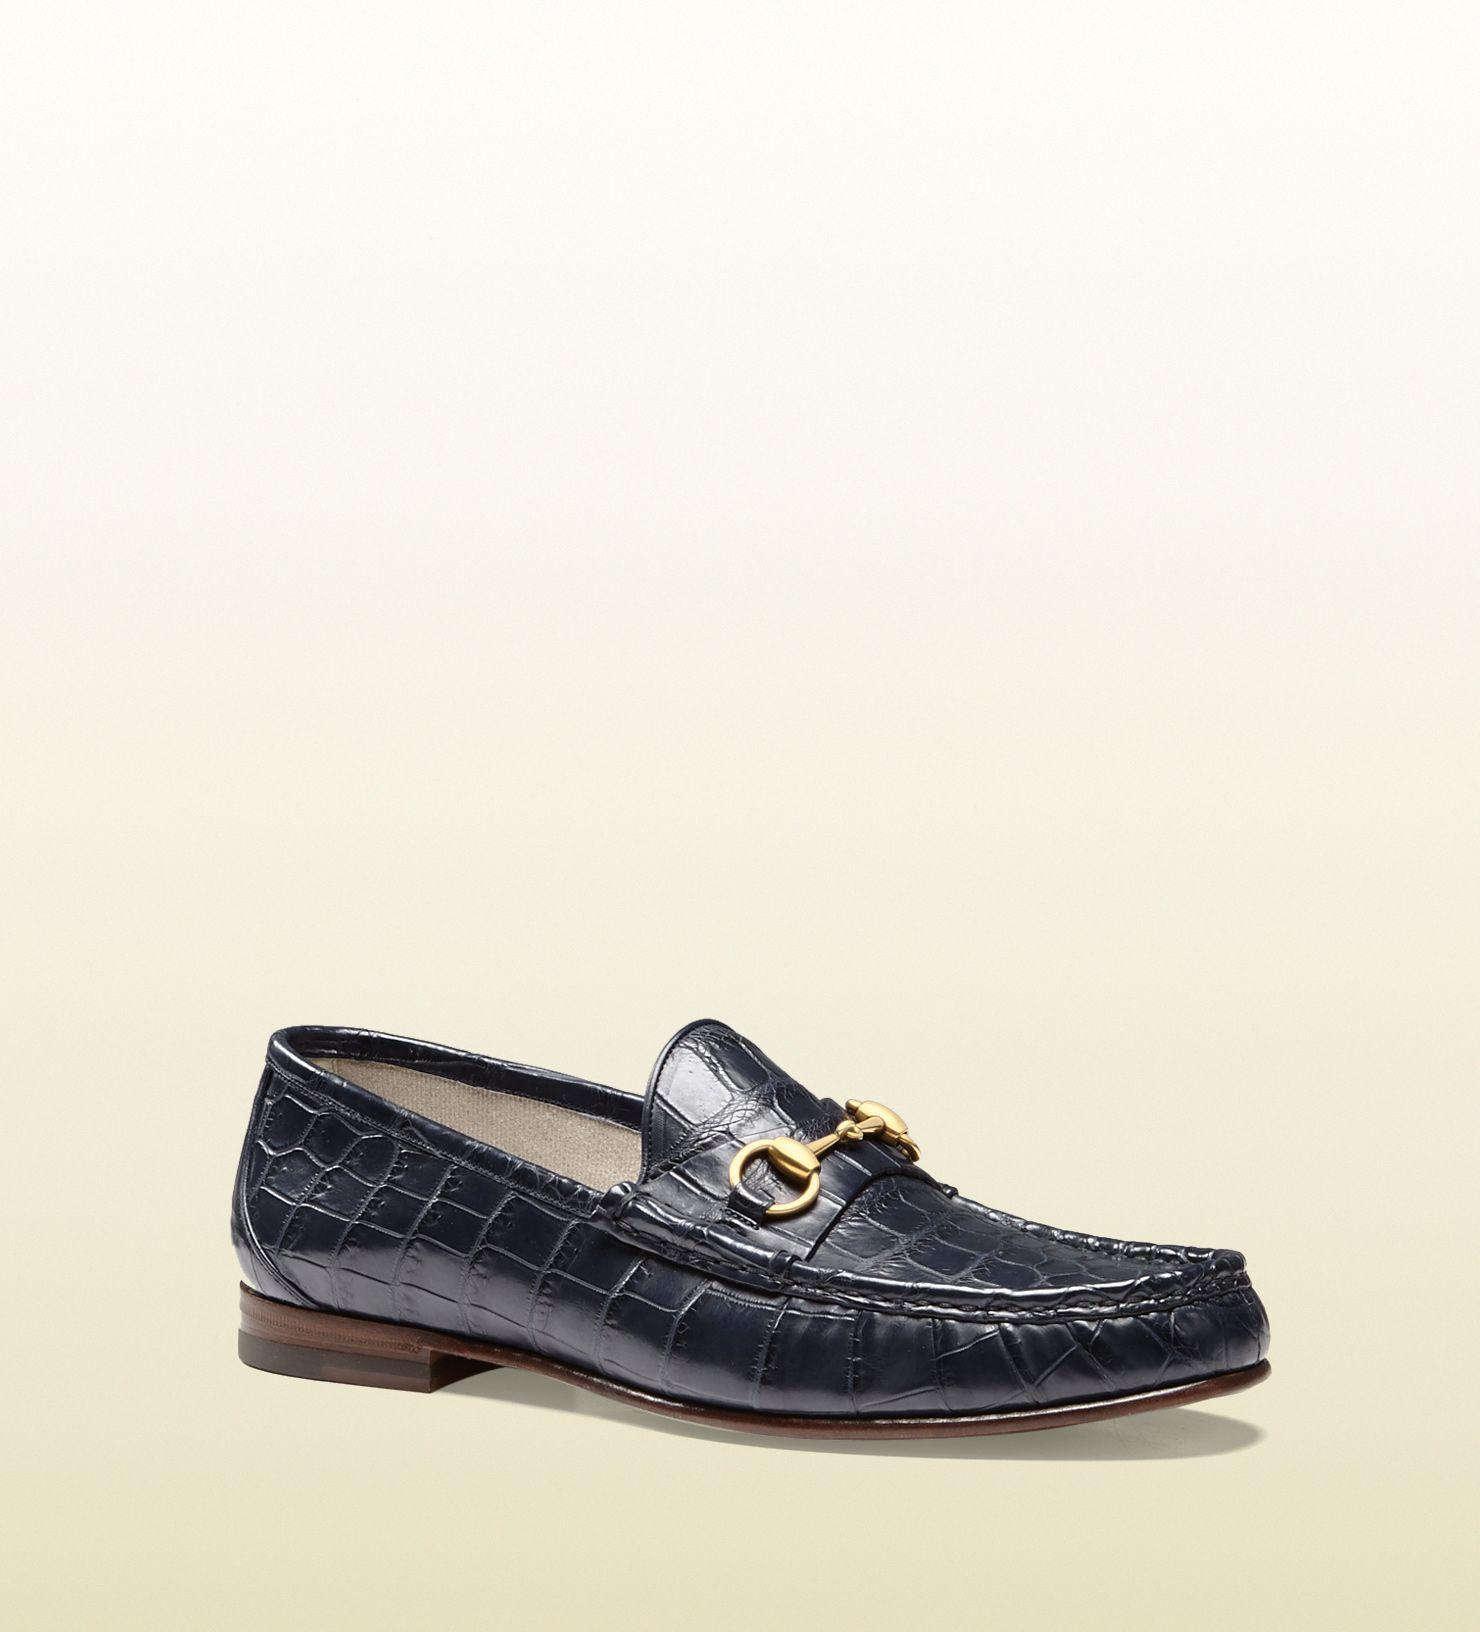 cd2d2688a99 1953 horsebit crocodile loafer